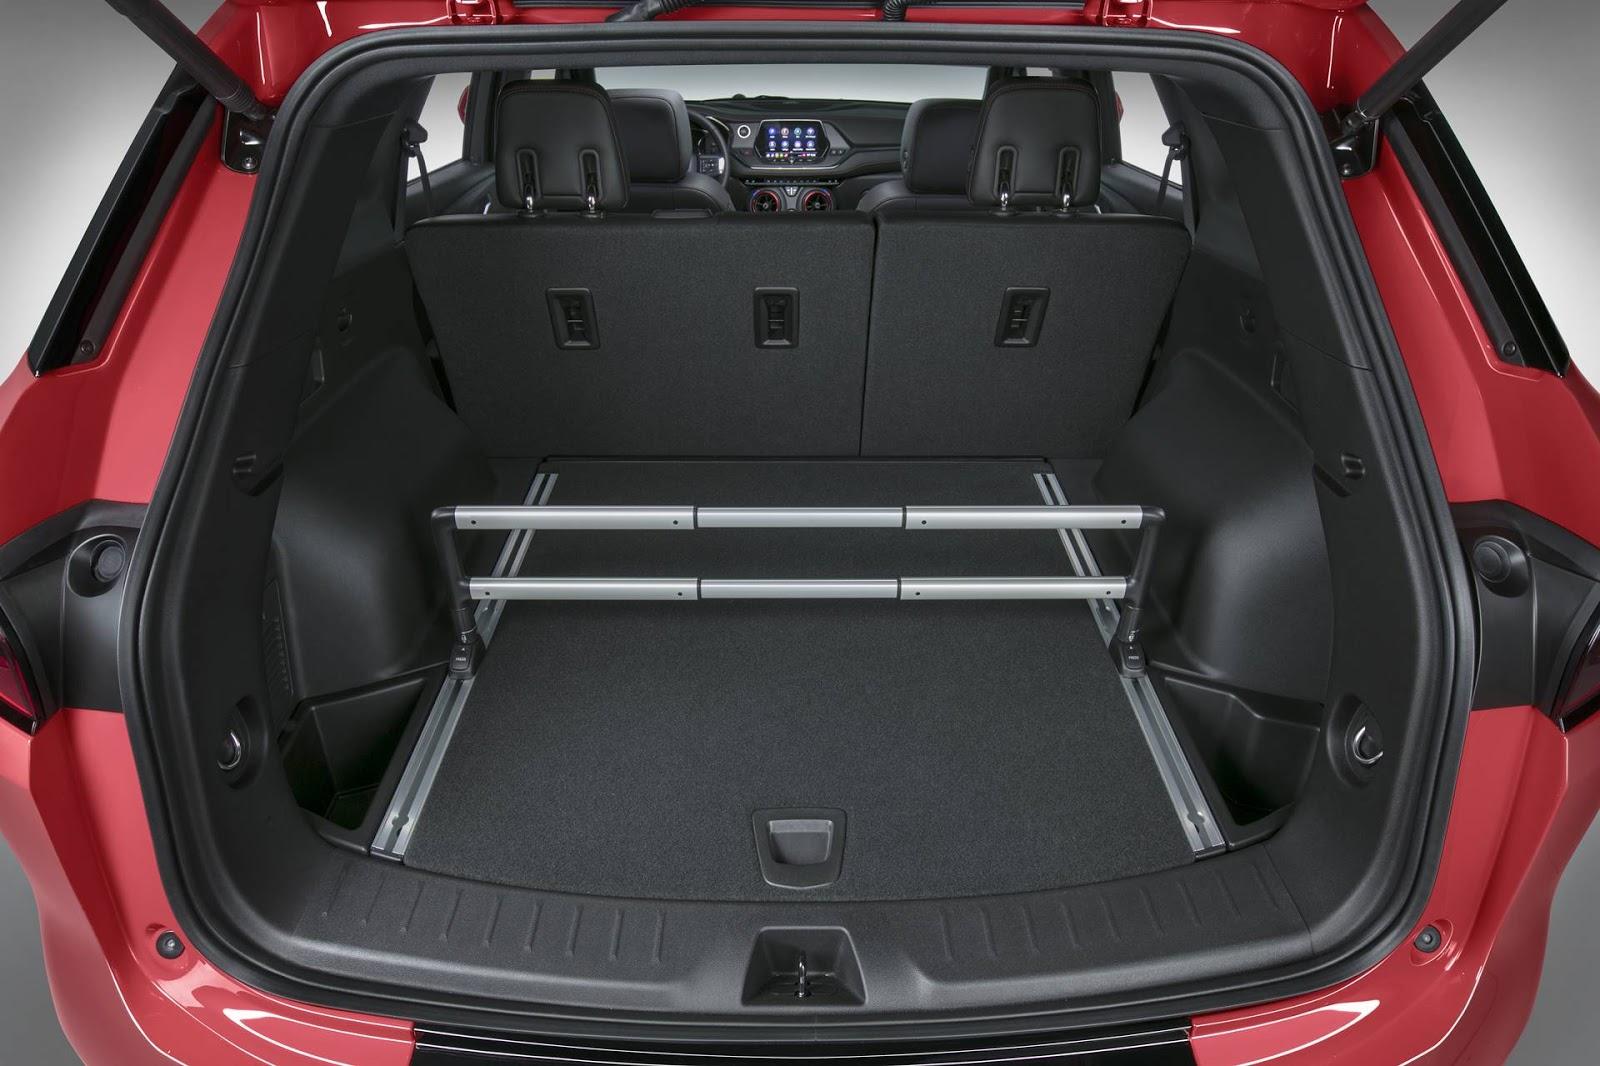 Novo Chevrolet Blazer 2019: SUV do Camaro - vídeo | CAR ...